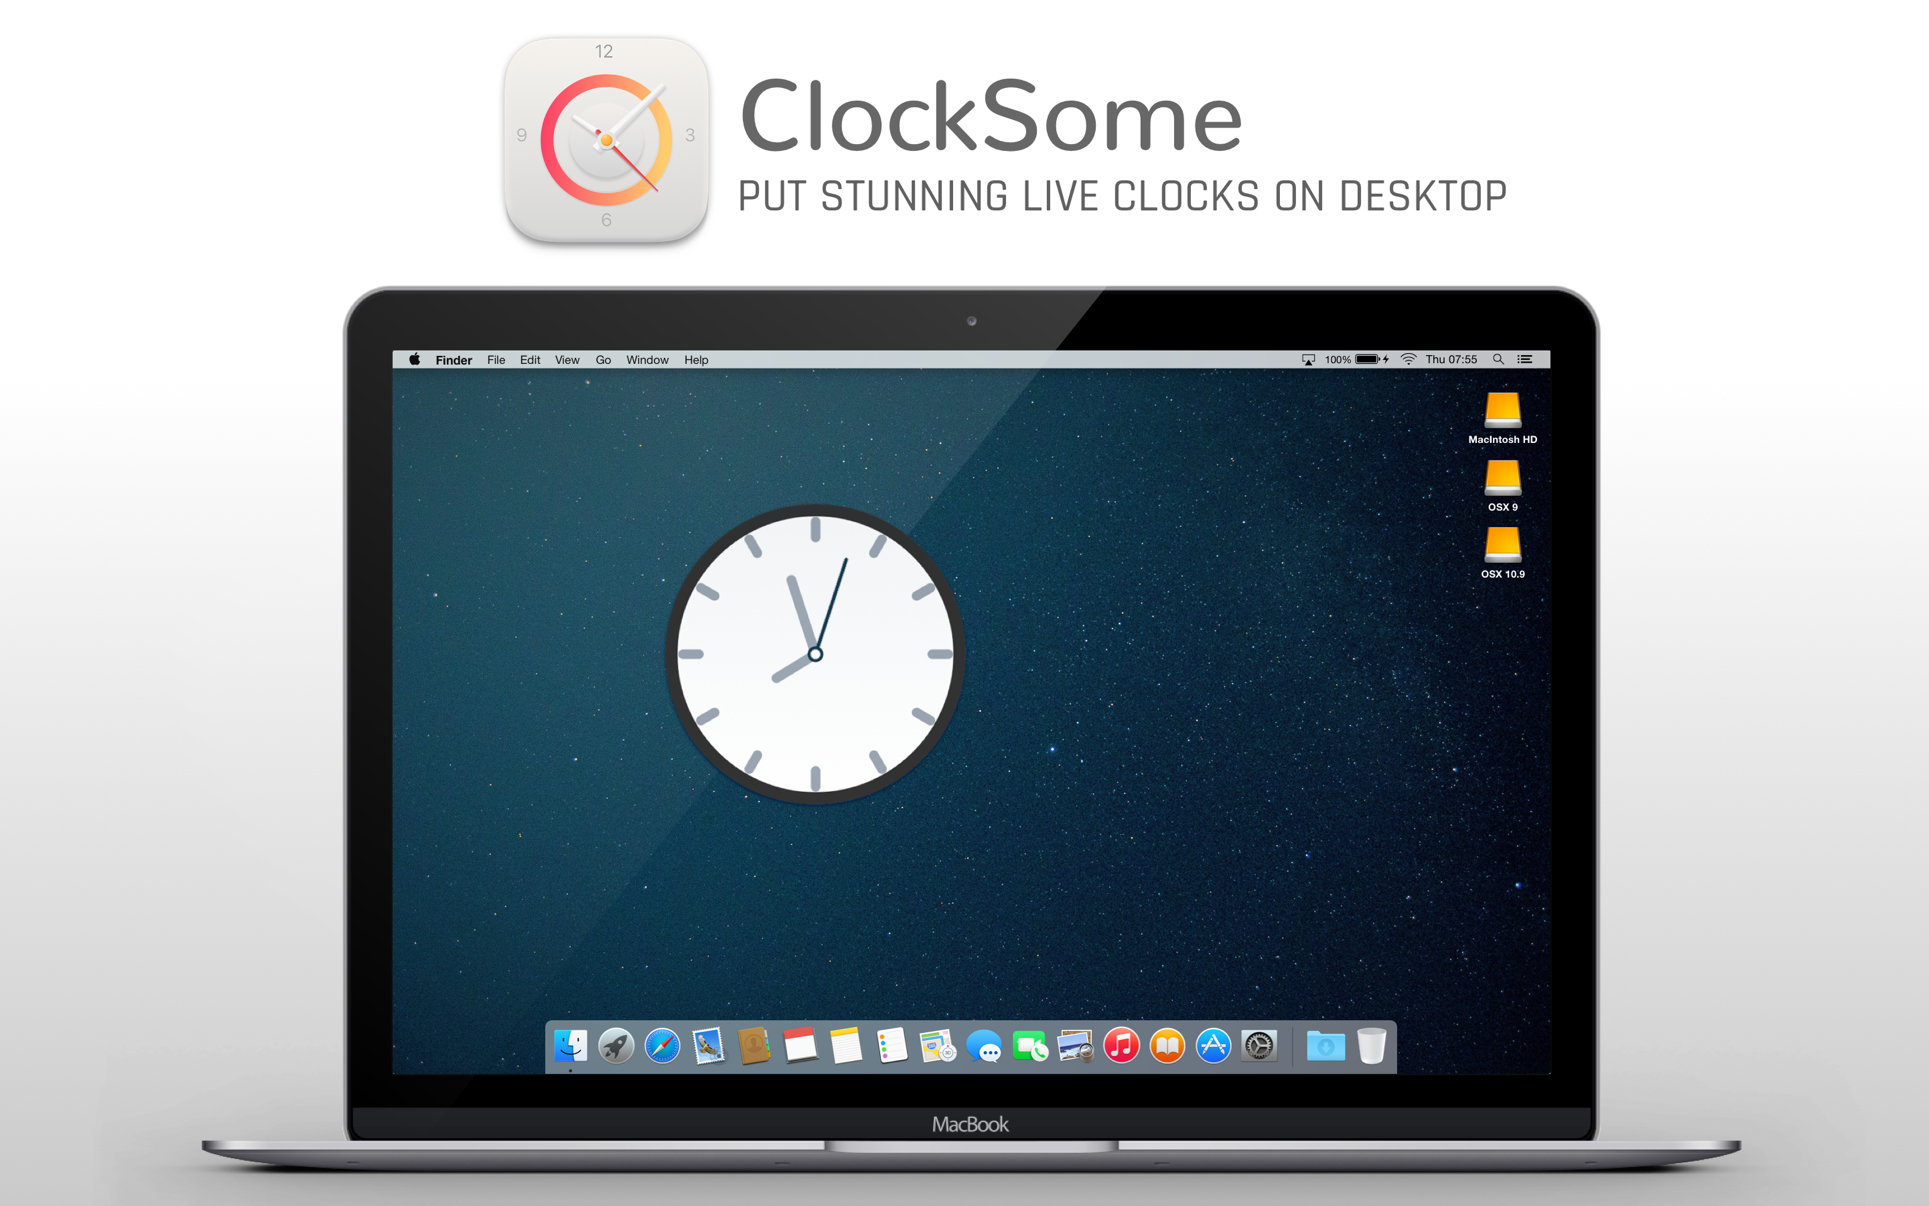 ClockSome